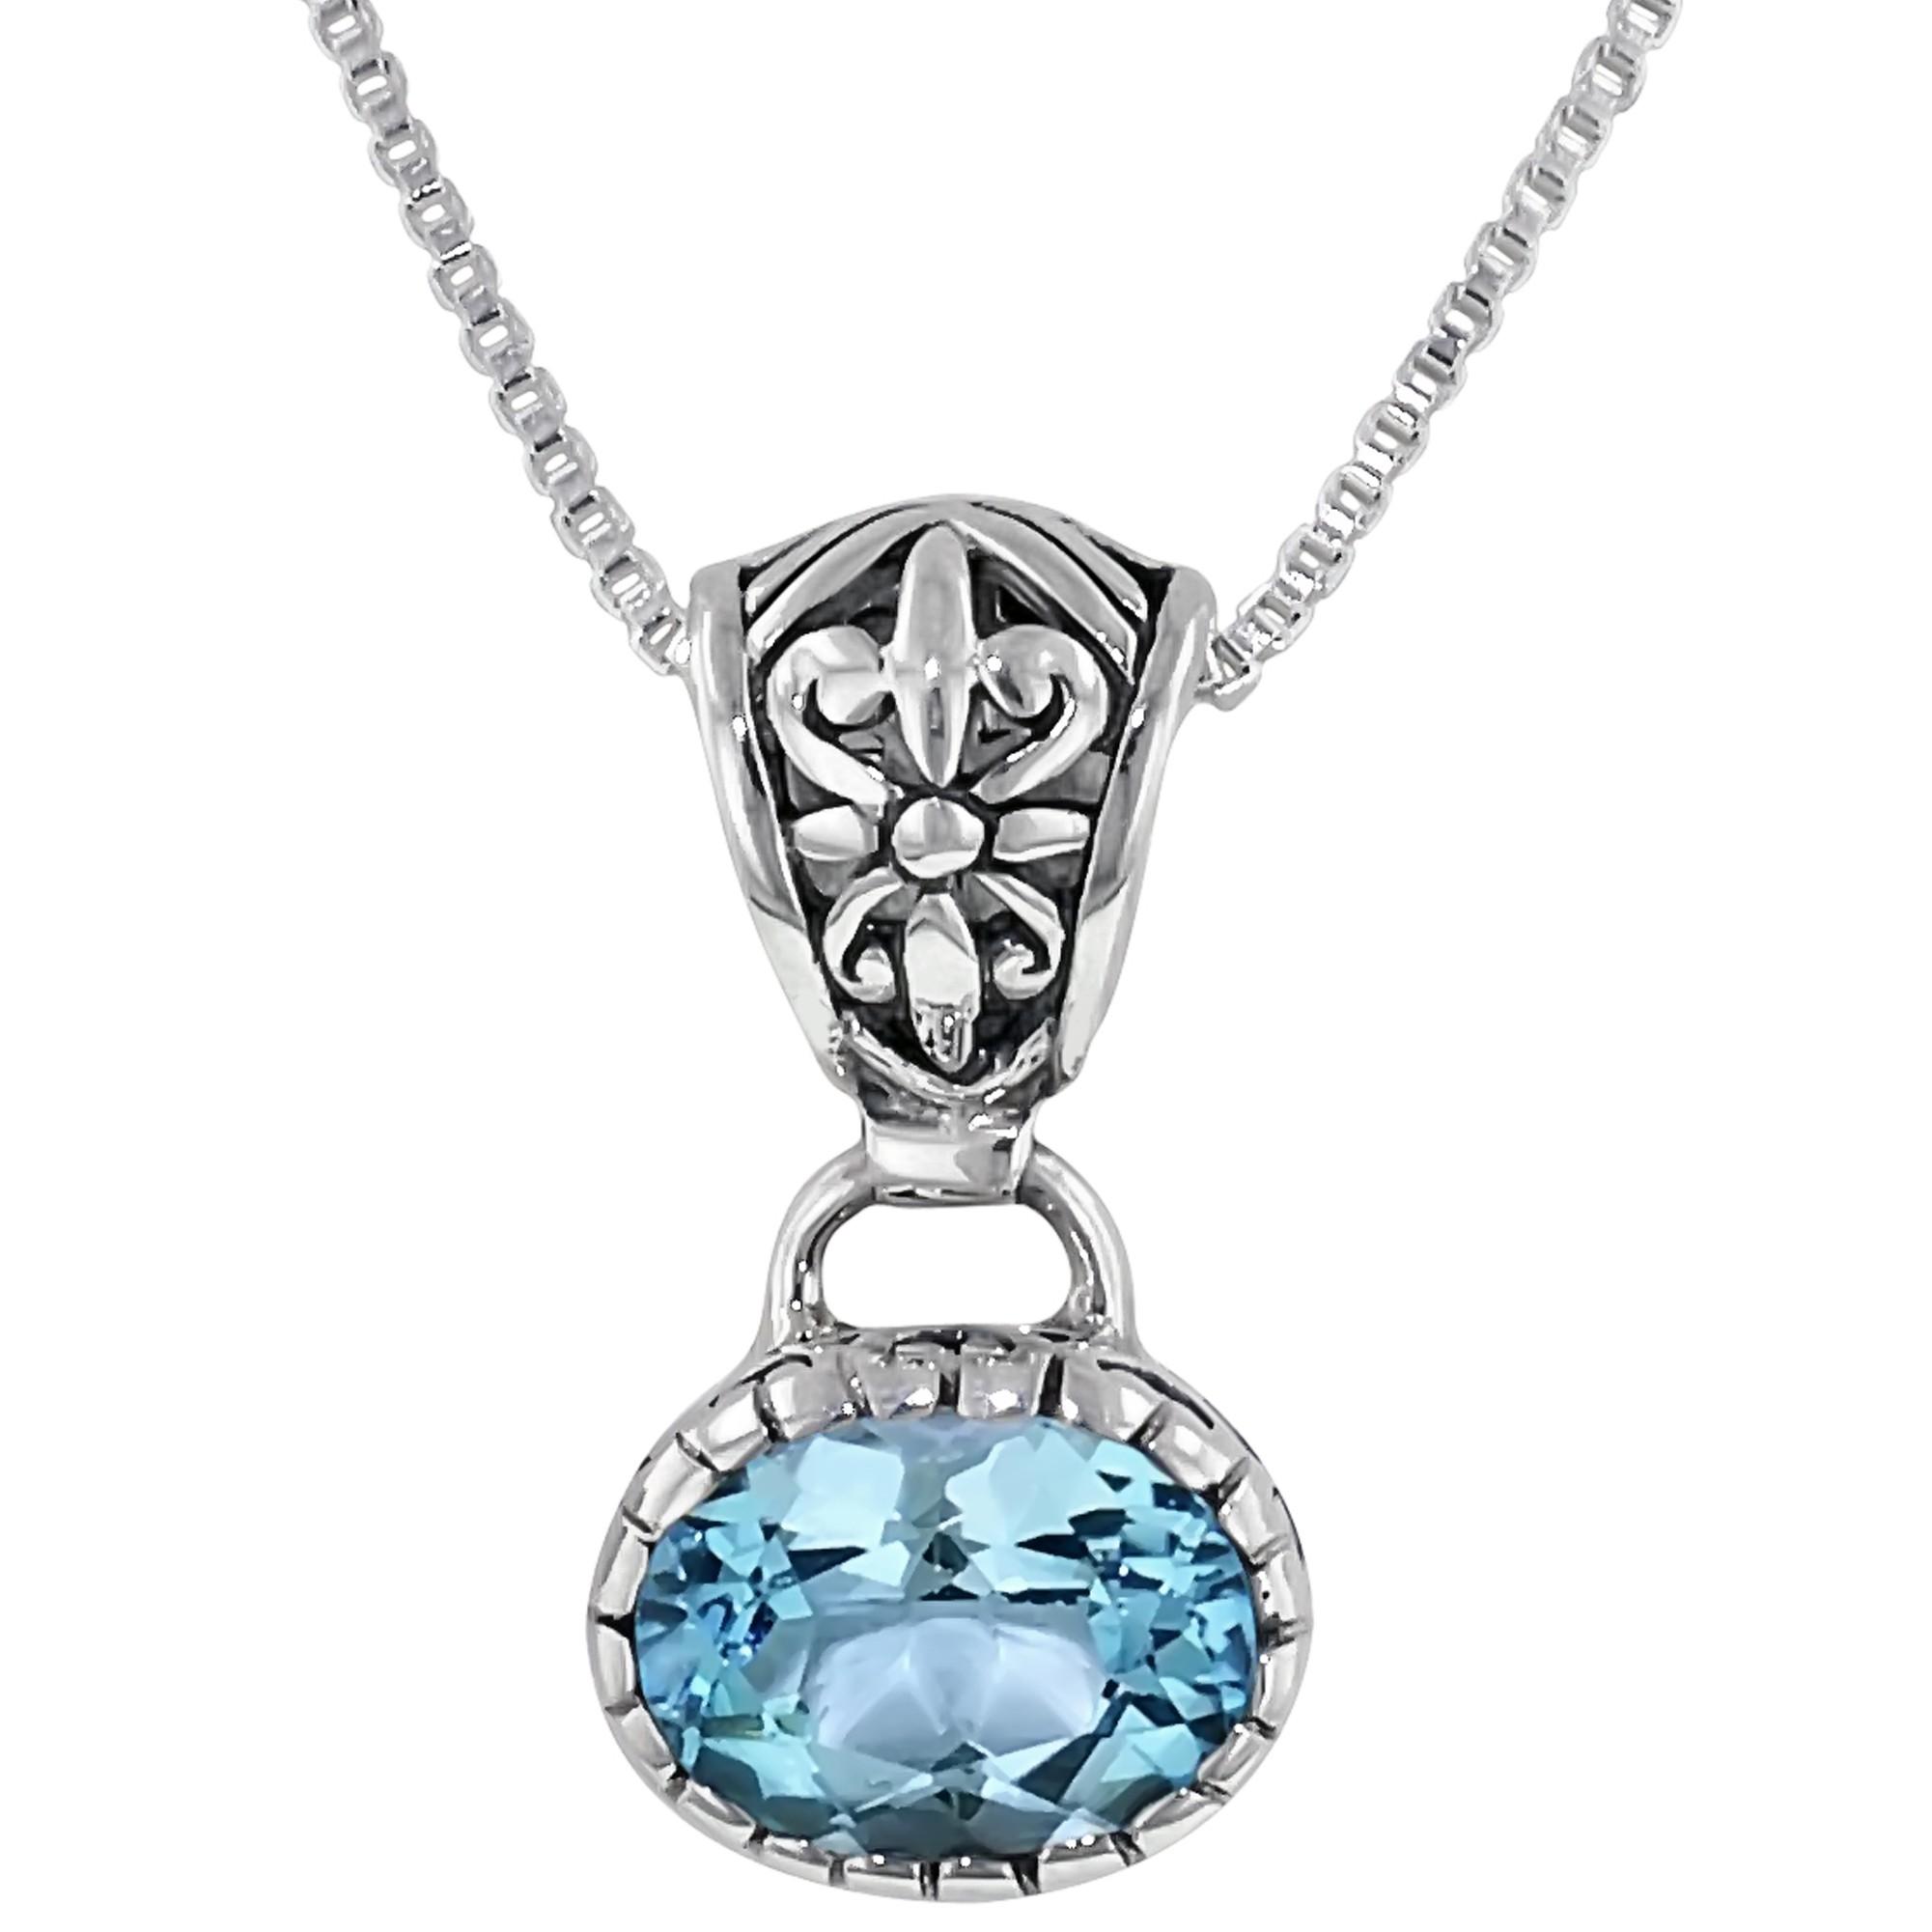 nbtps0110_1_2_1-necklace blue.jpg